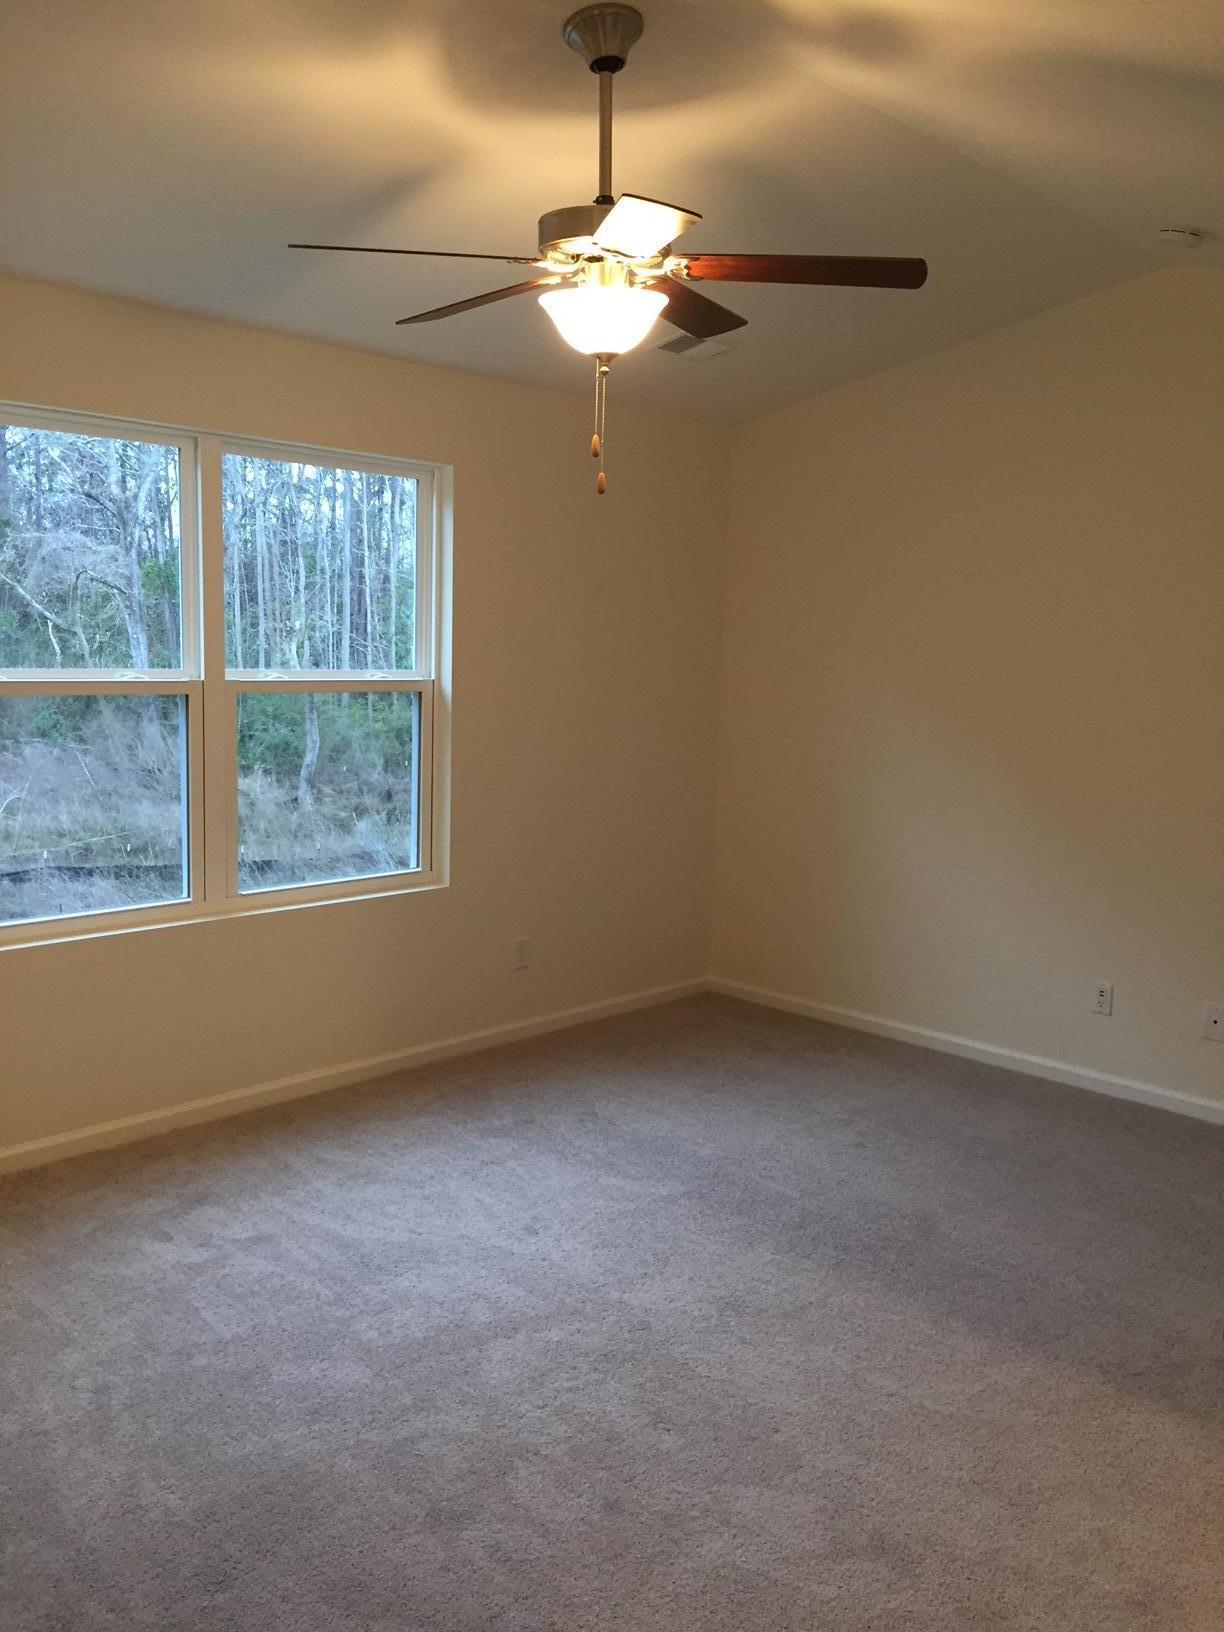 Riverland Place Homes For Sale - 274 Stefan, Charleston, SC - 14